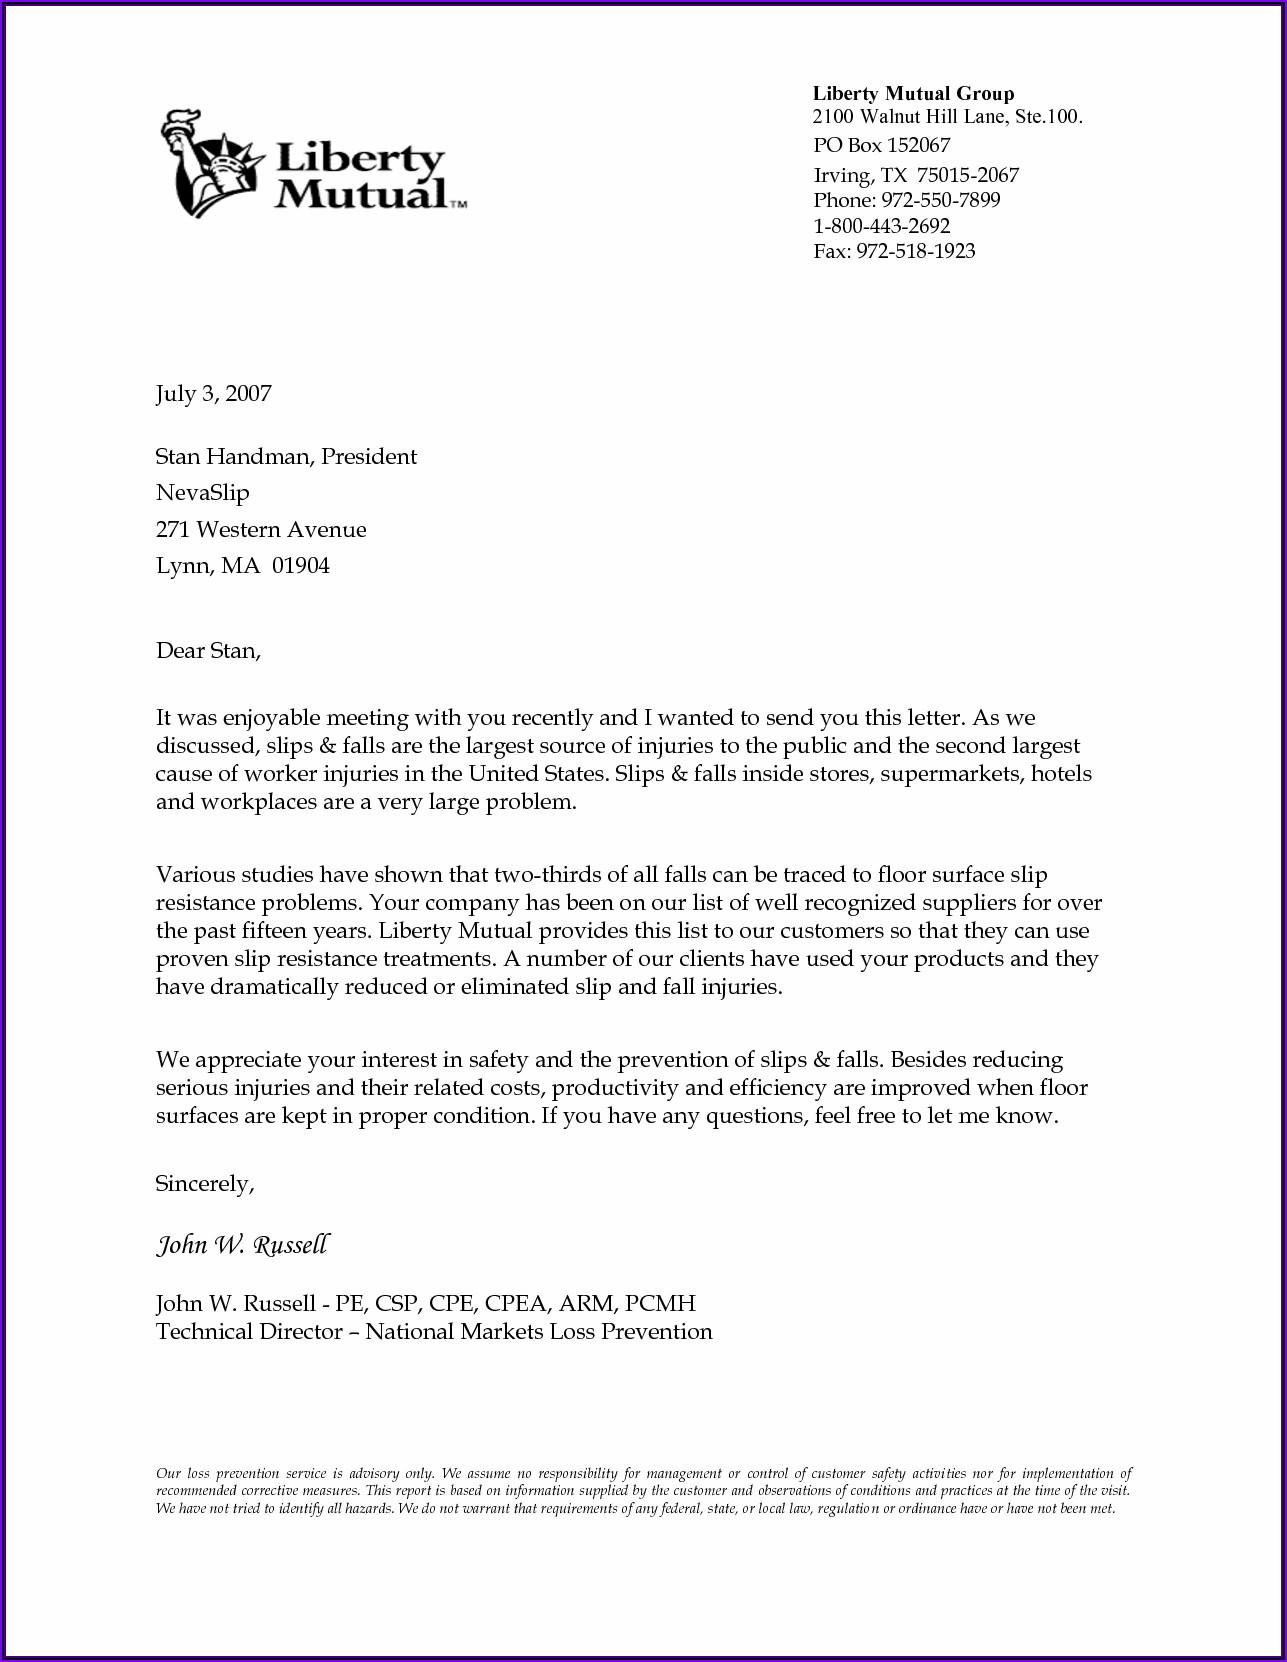 Business Letter Sample Word